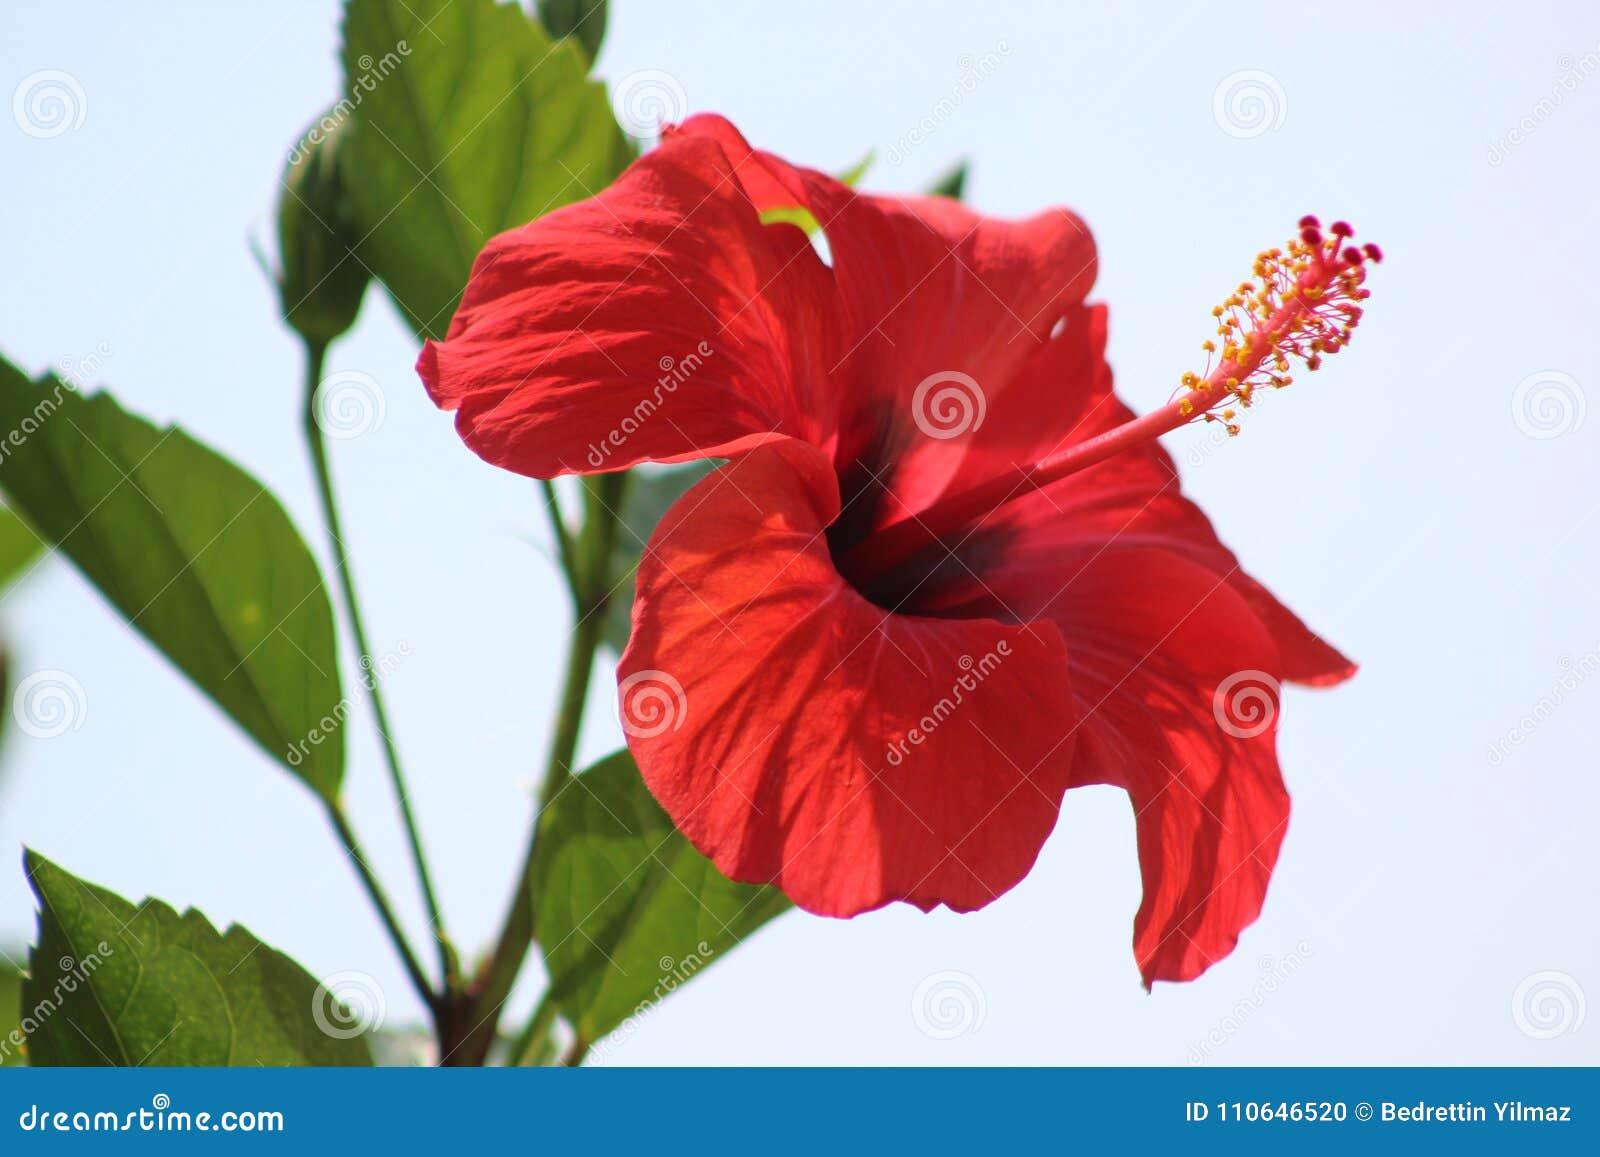 Hibiscus flower stock photo image of fabulous park 110646520 download comp izmirmasajfo